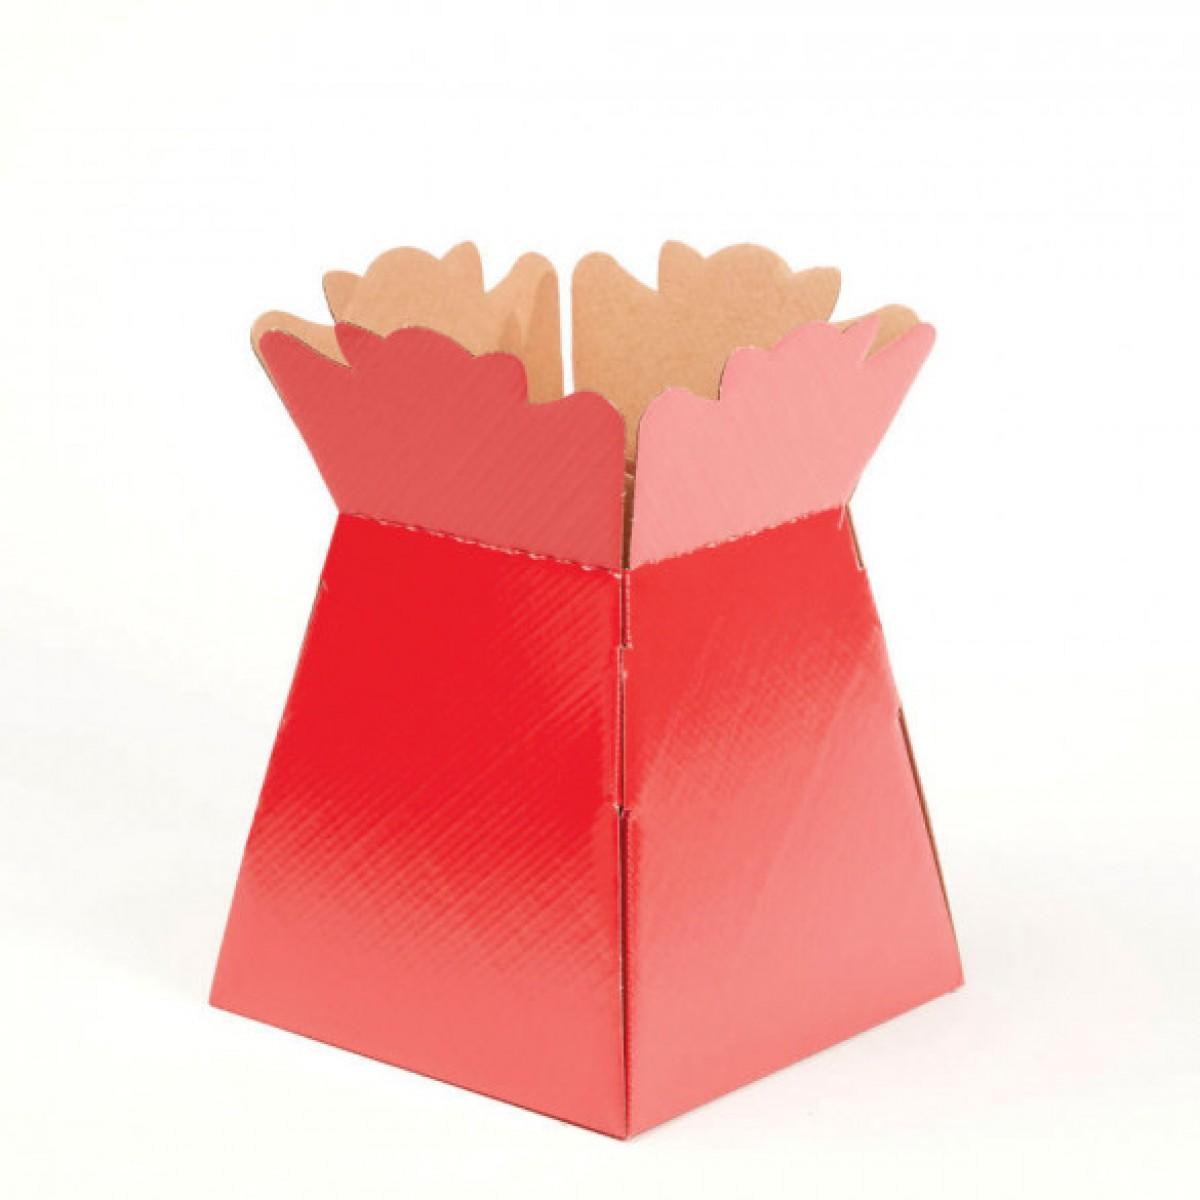 Porto Vase Red 17x24cm - Pack Of 5